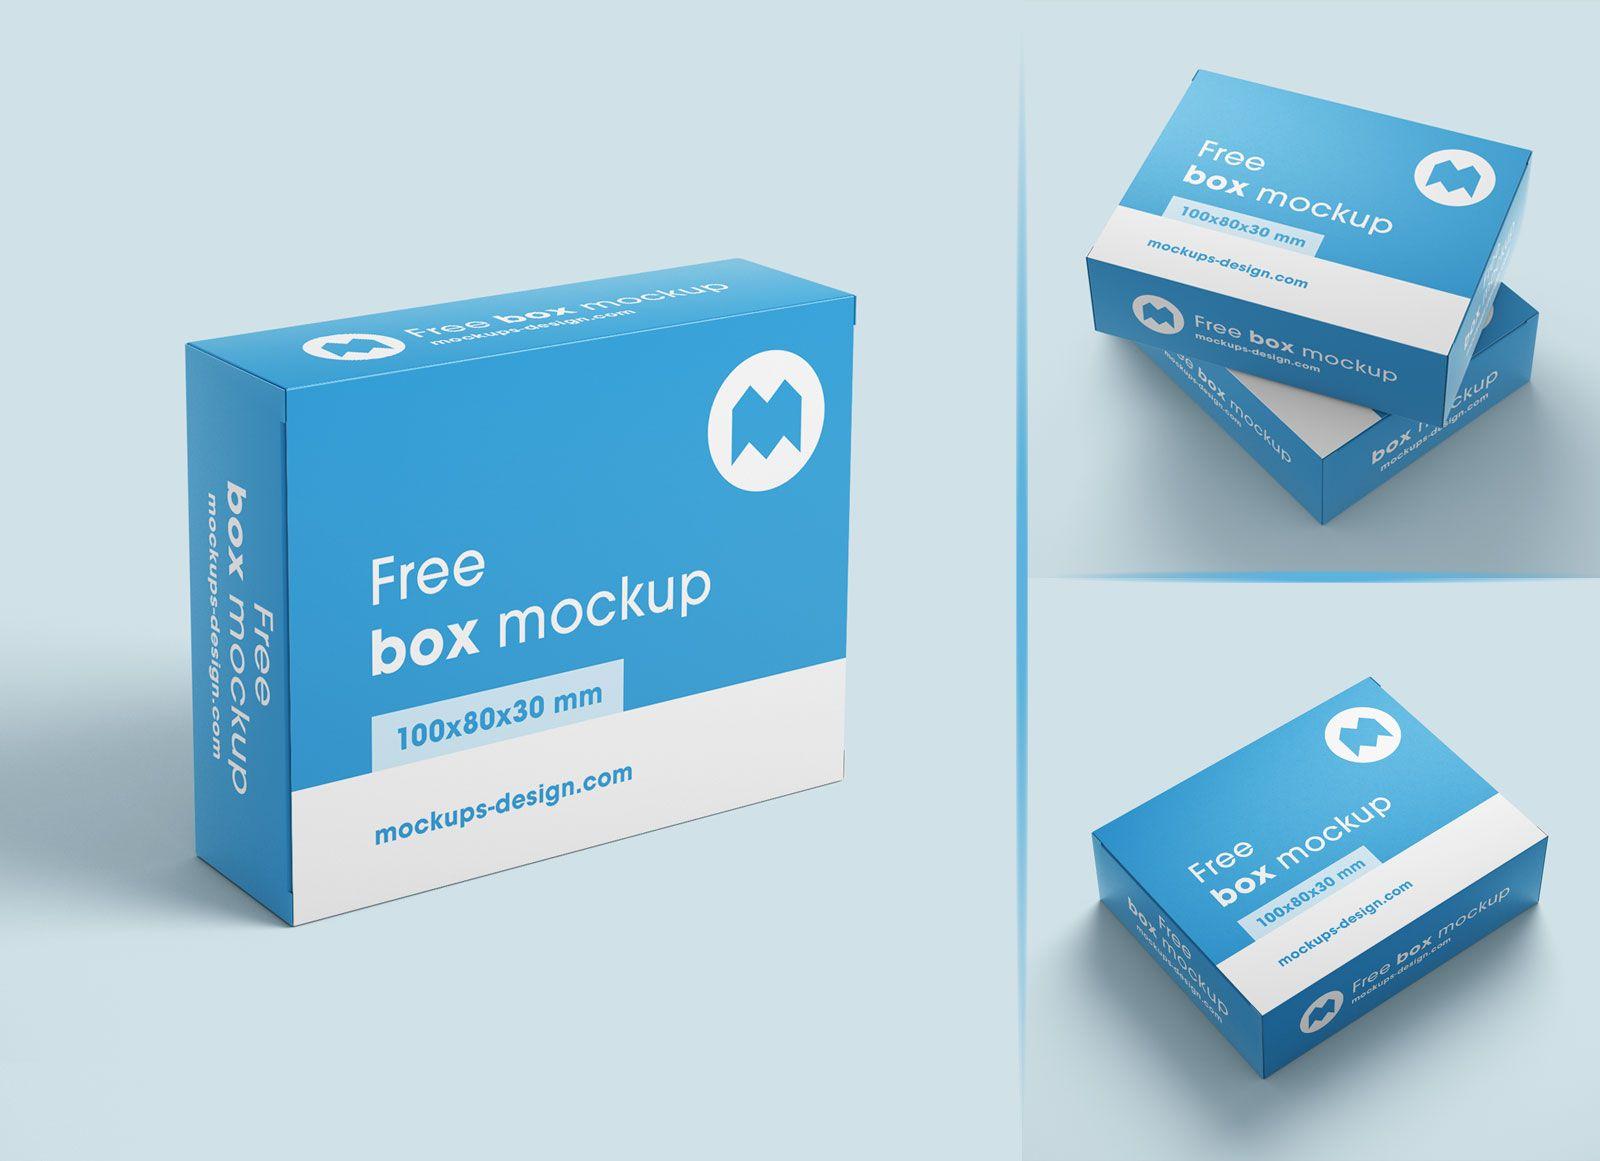 Free Box Packaging Mockup Psd Set Packaging Mockup Medicine Box Design Free Boxes